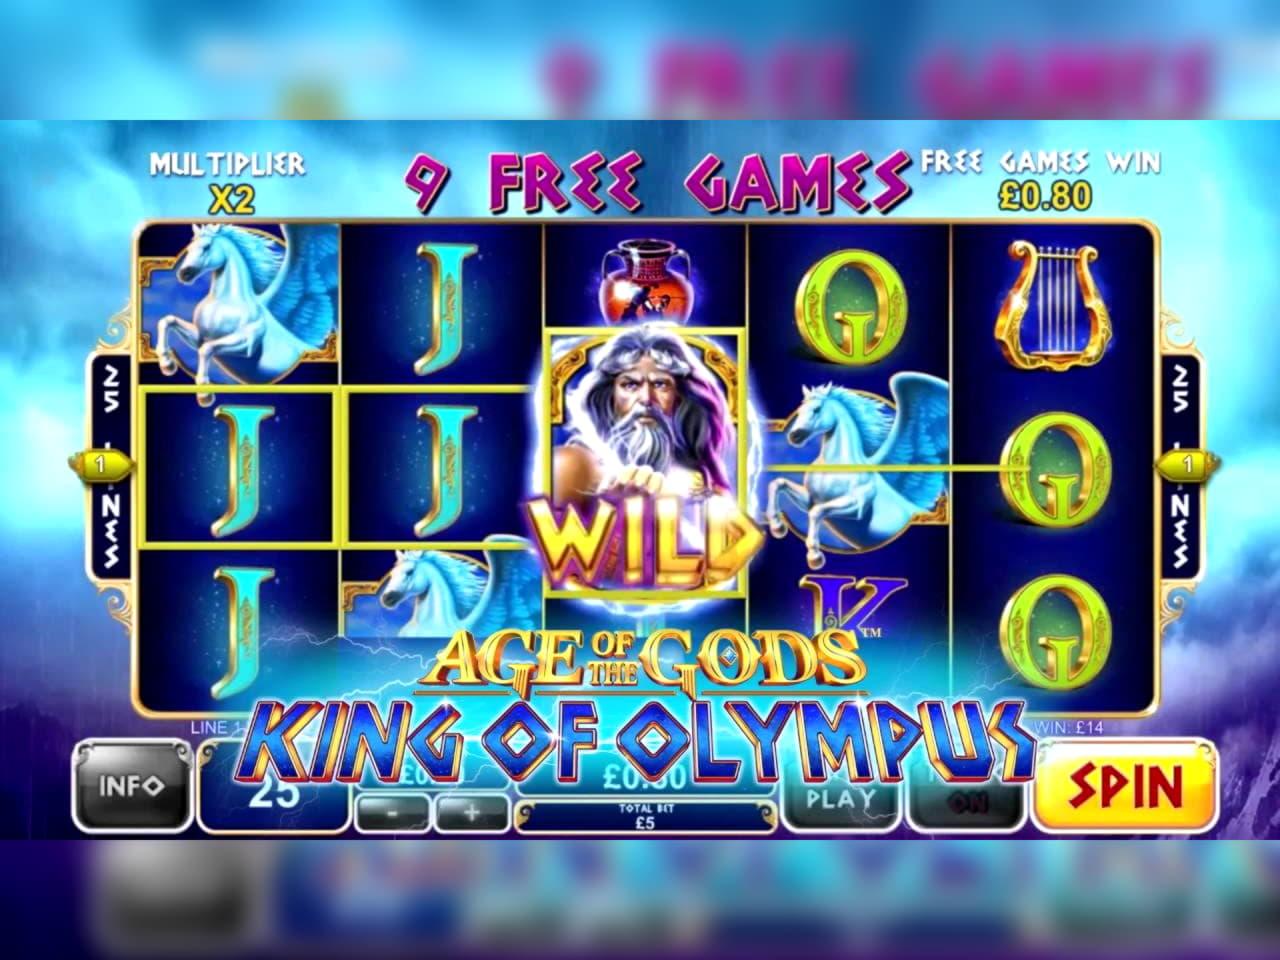 465% Signup Casino Bonus at Casino com